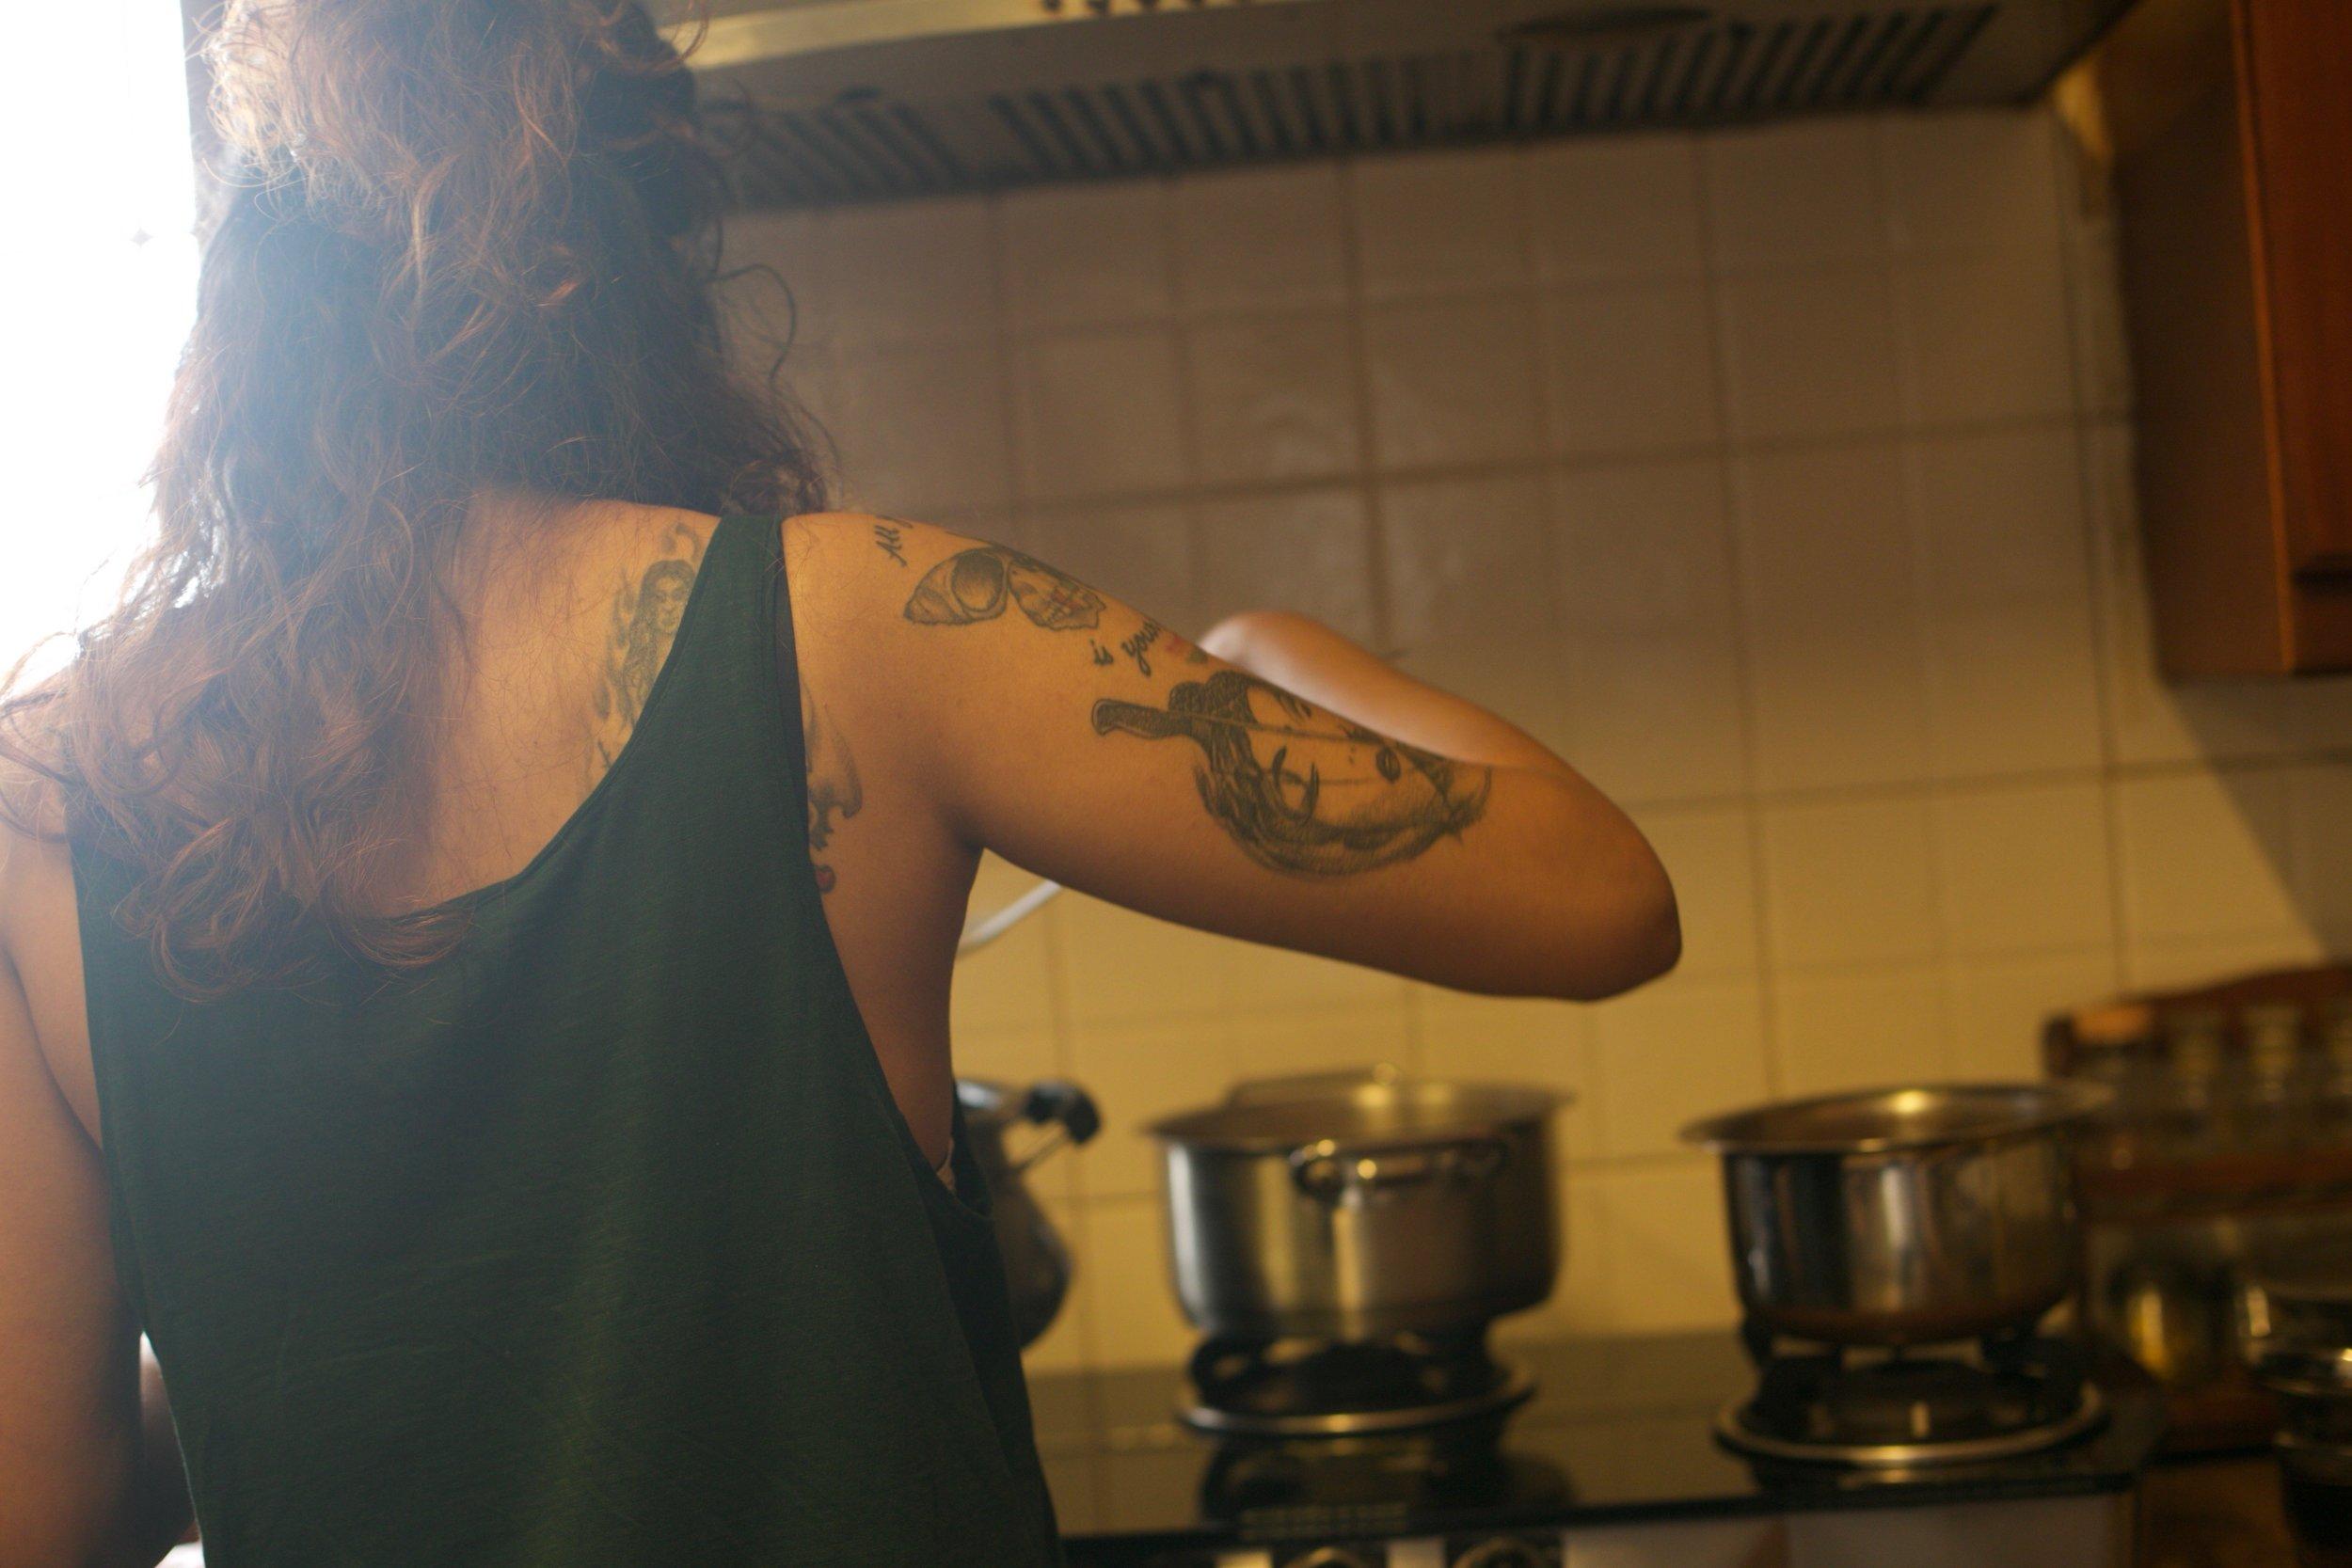 Jeet Thayil and Tia Anasuya cook in their Bengaluru residence for #1000Kitchens